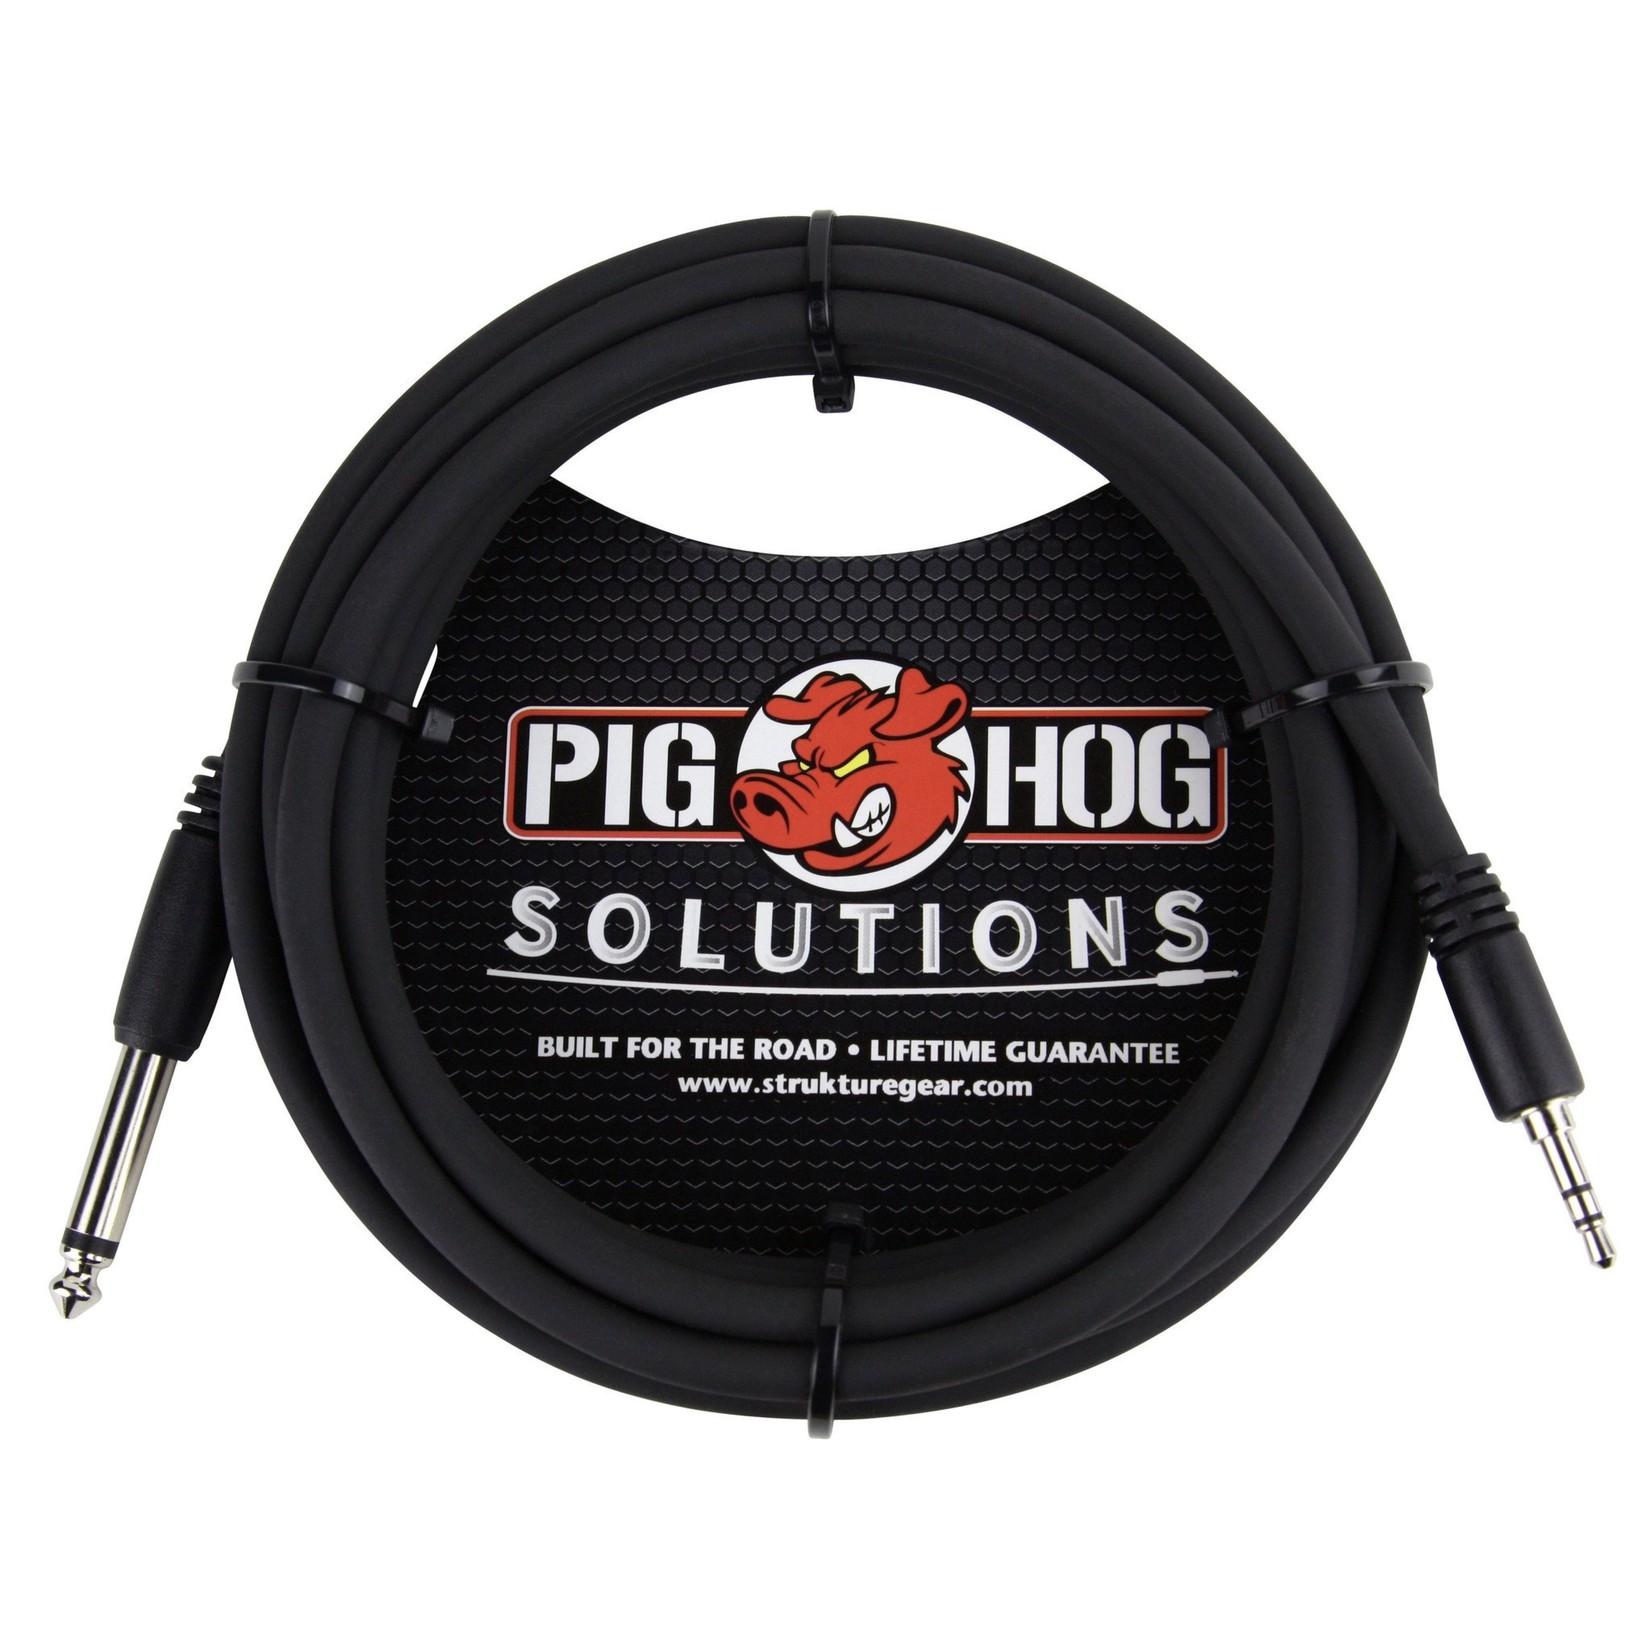 "Pig Hog Pig Hog Solutions 10-Foot 3.5mm TRS to 1/4"" Mono, PX-35T4M"